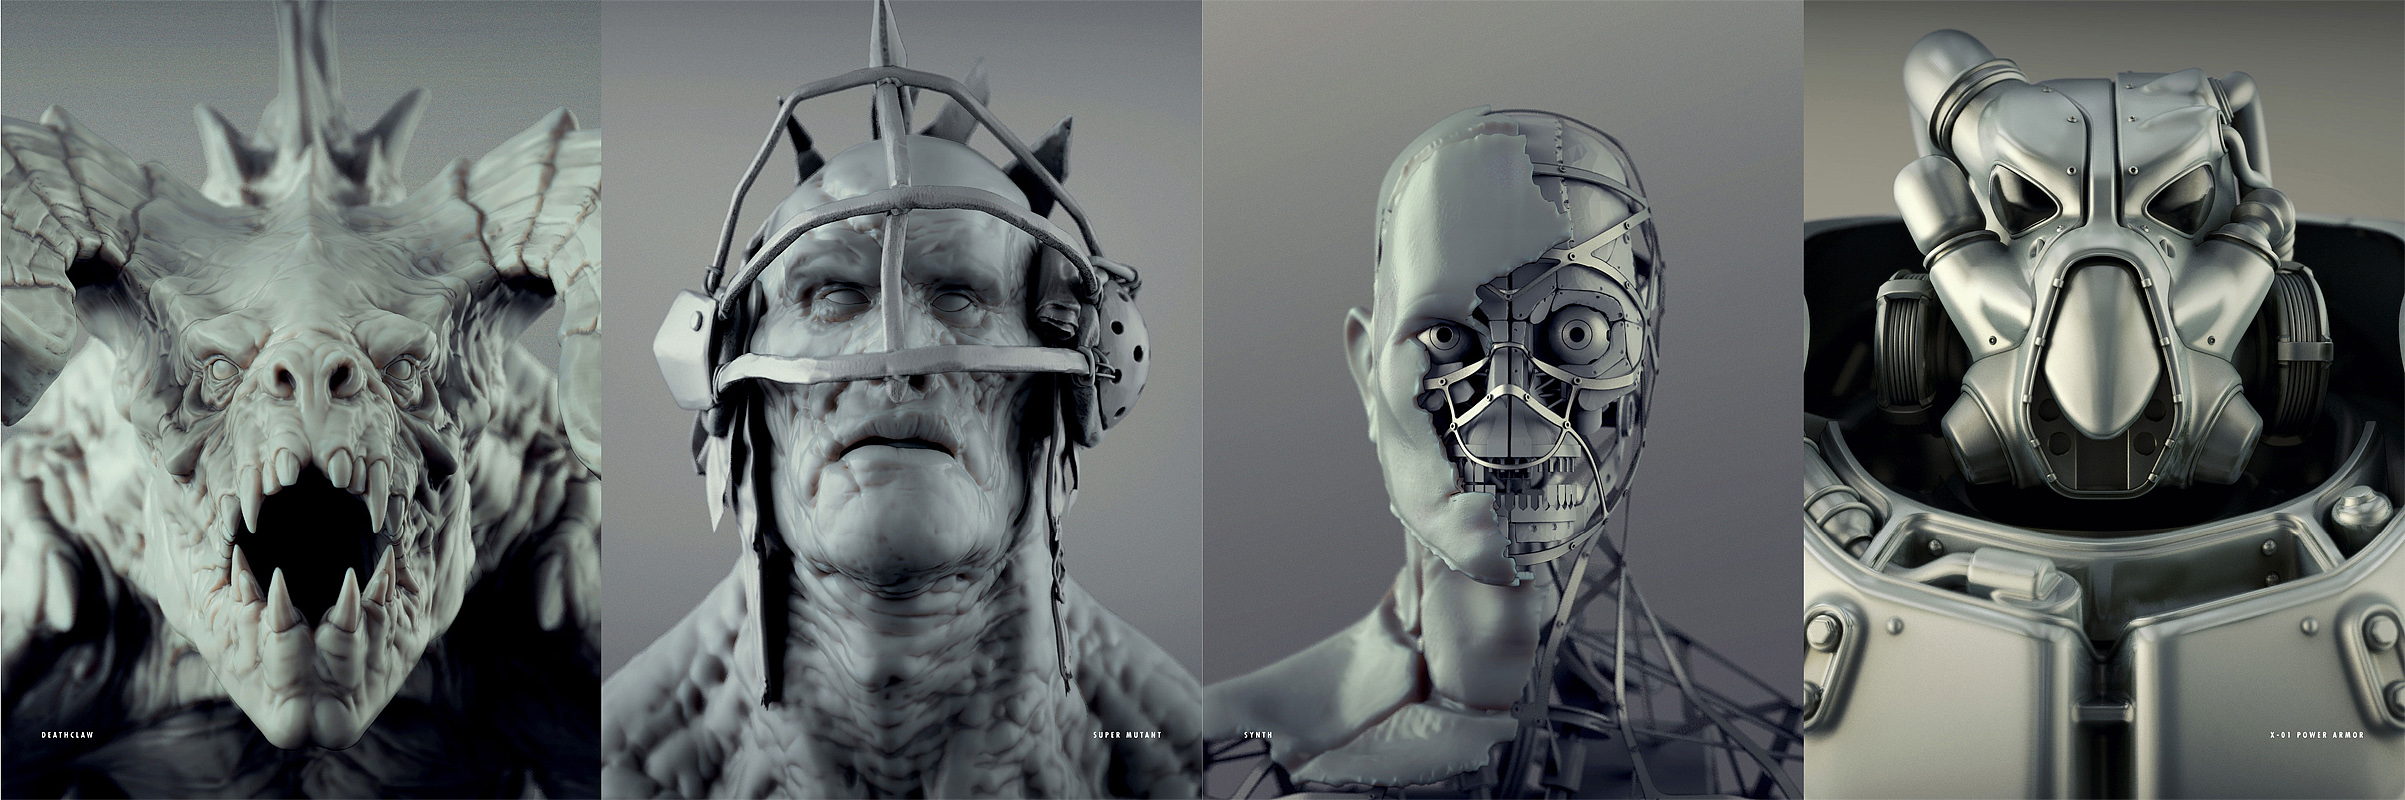 Fo4 creatures heads concept art